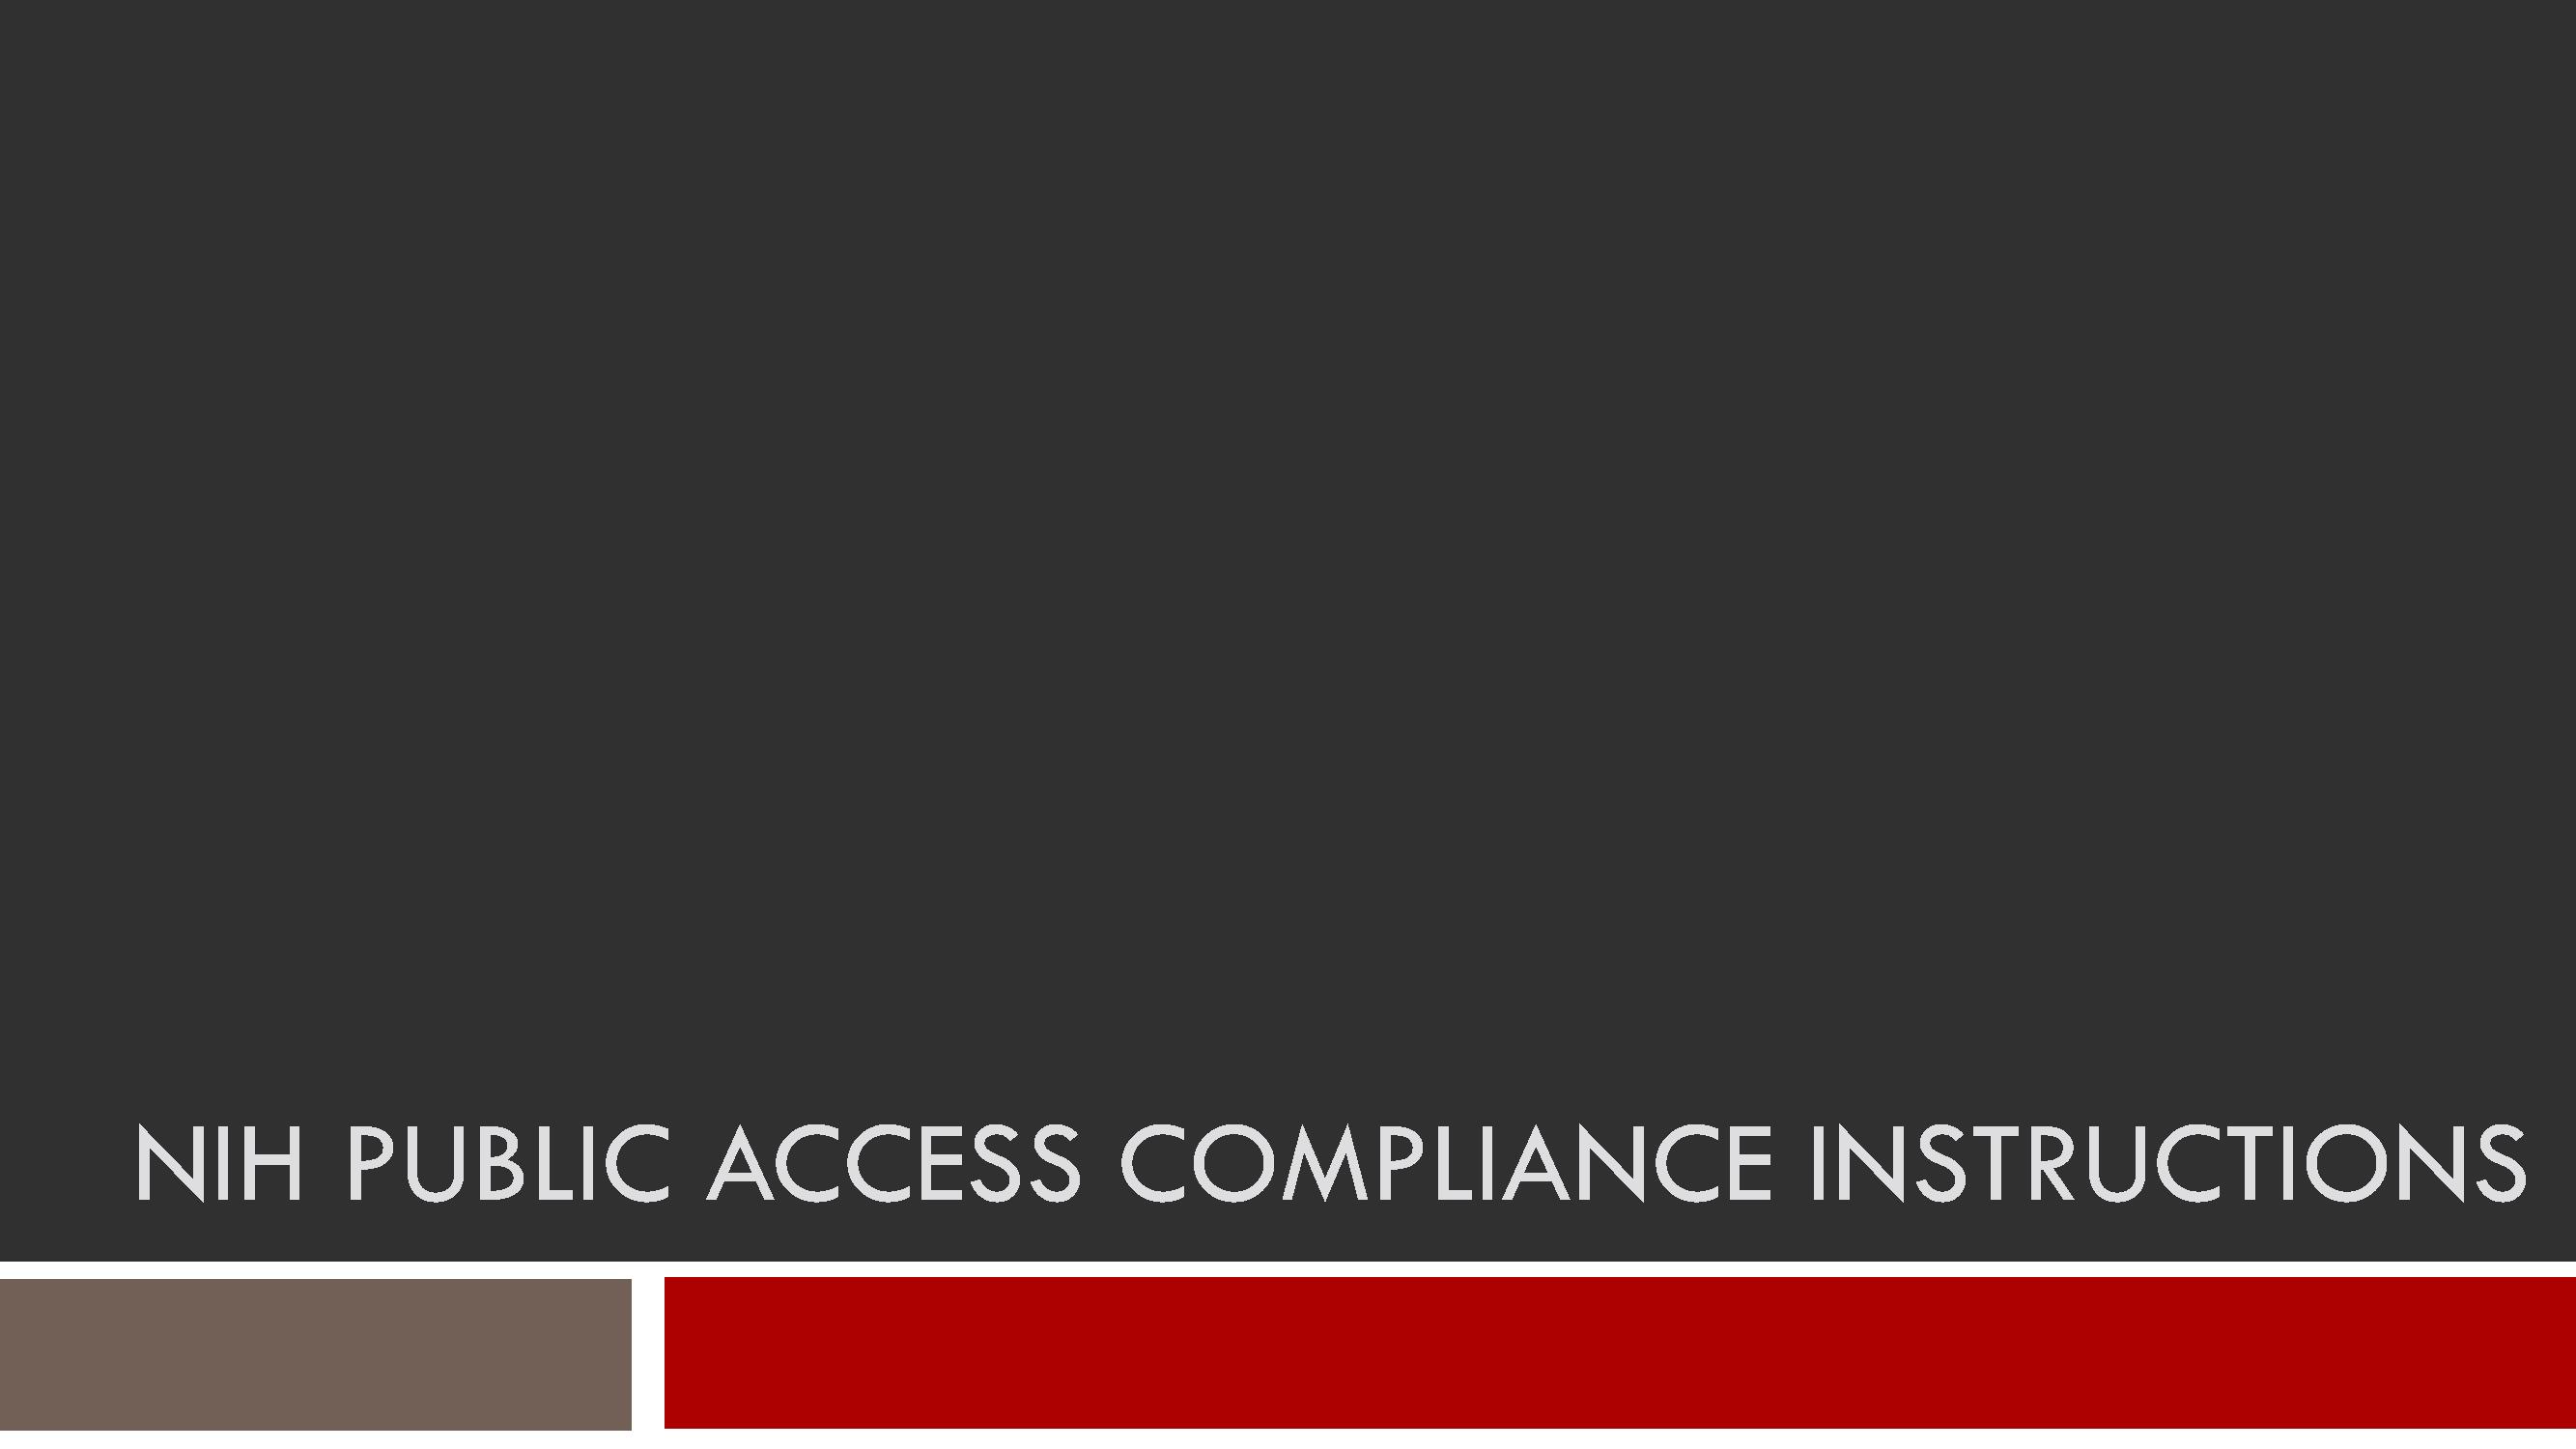 Presentation: NIH Public Access Compliance Instructions